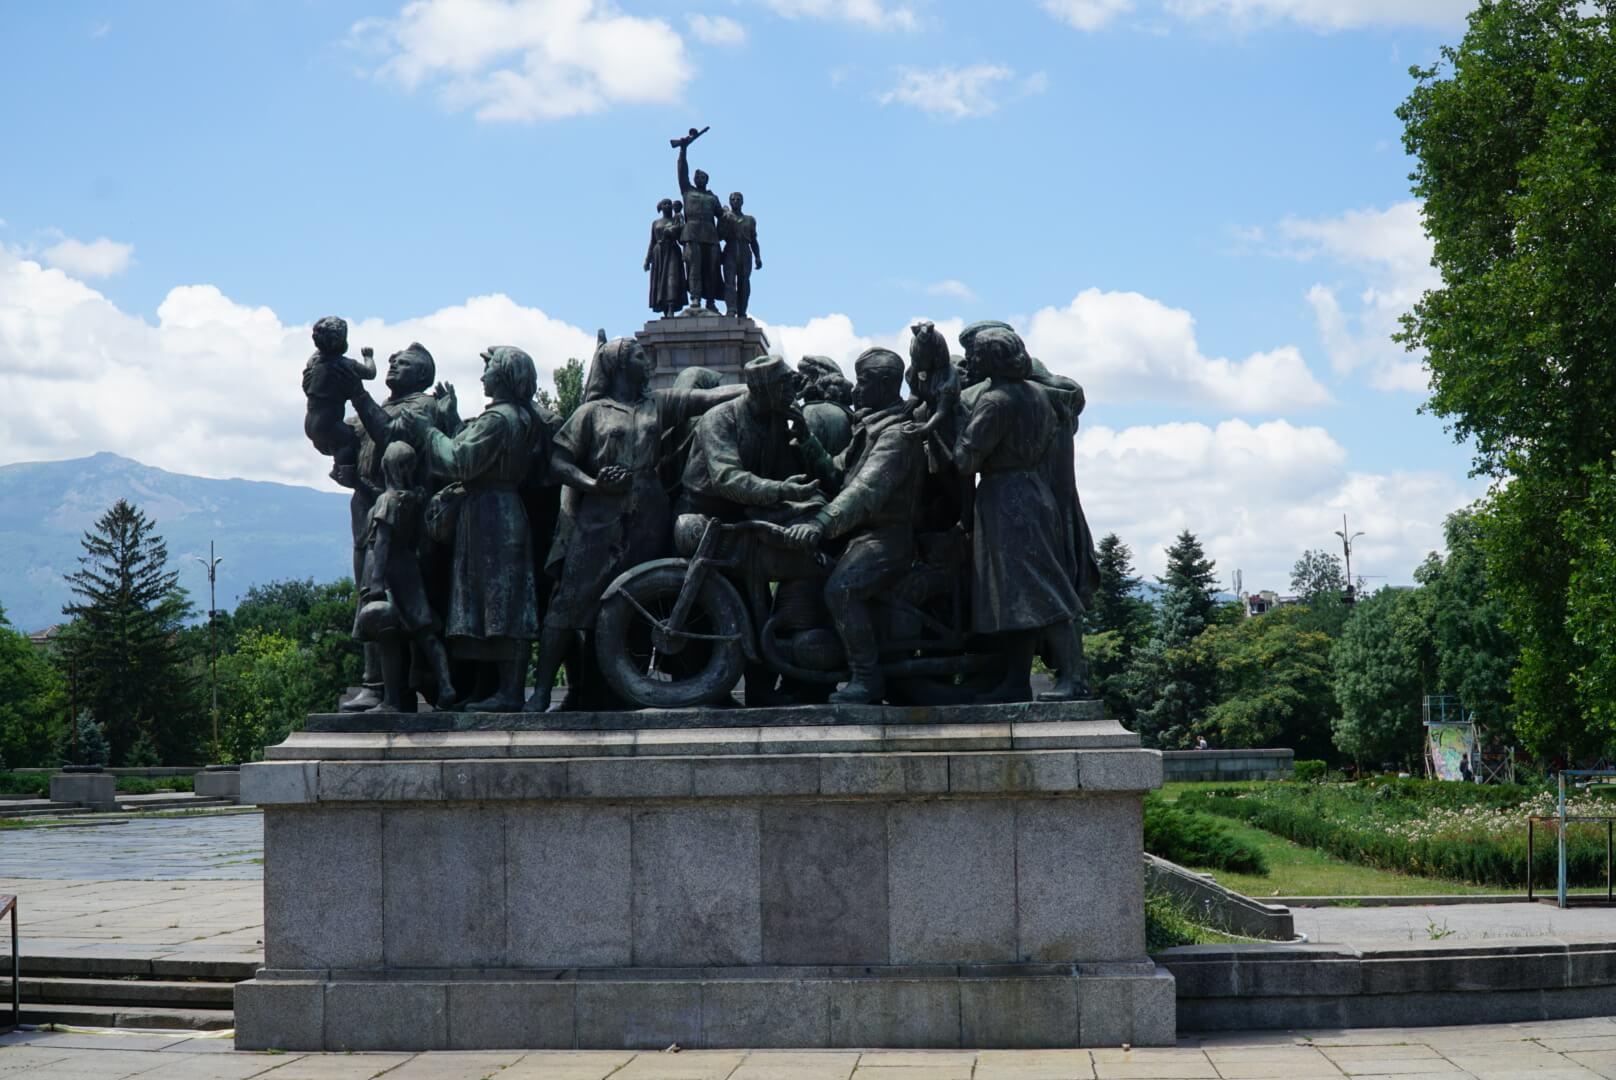 sofia-monumento-armata-rossa